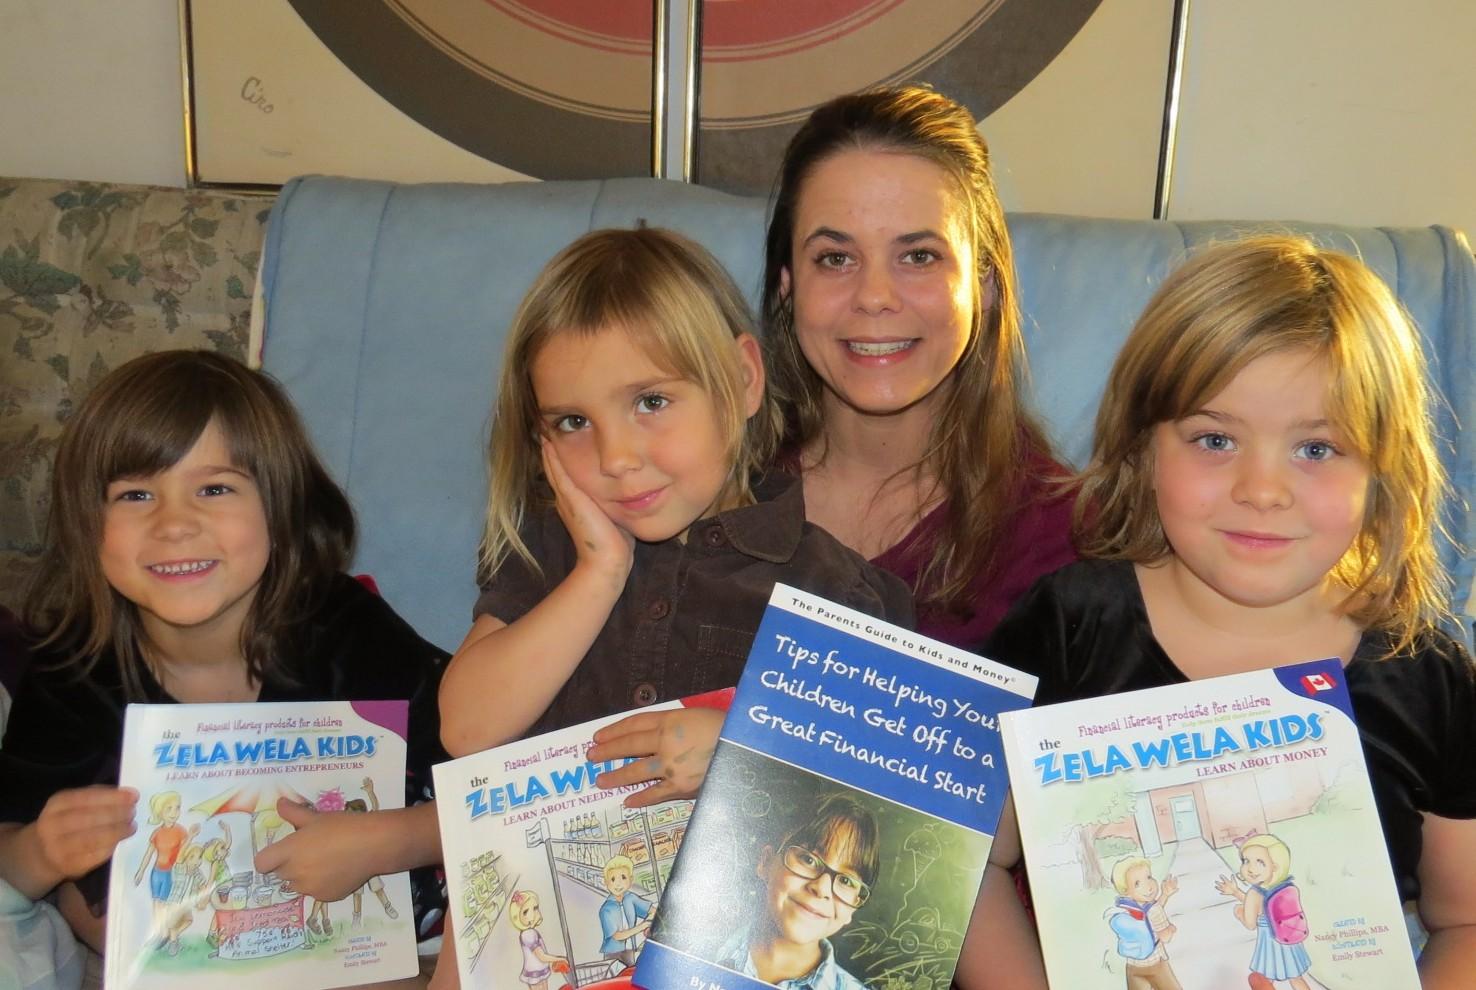 Deannie and her Zela Wela Kids